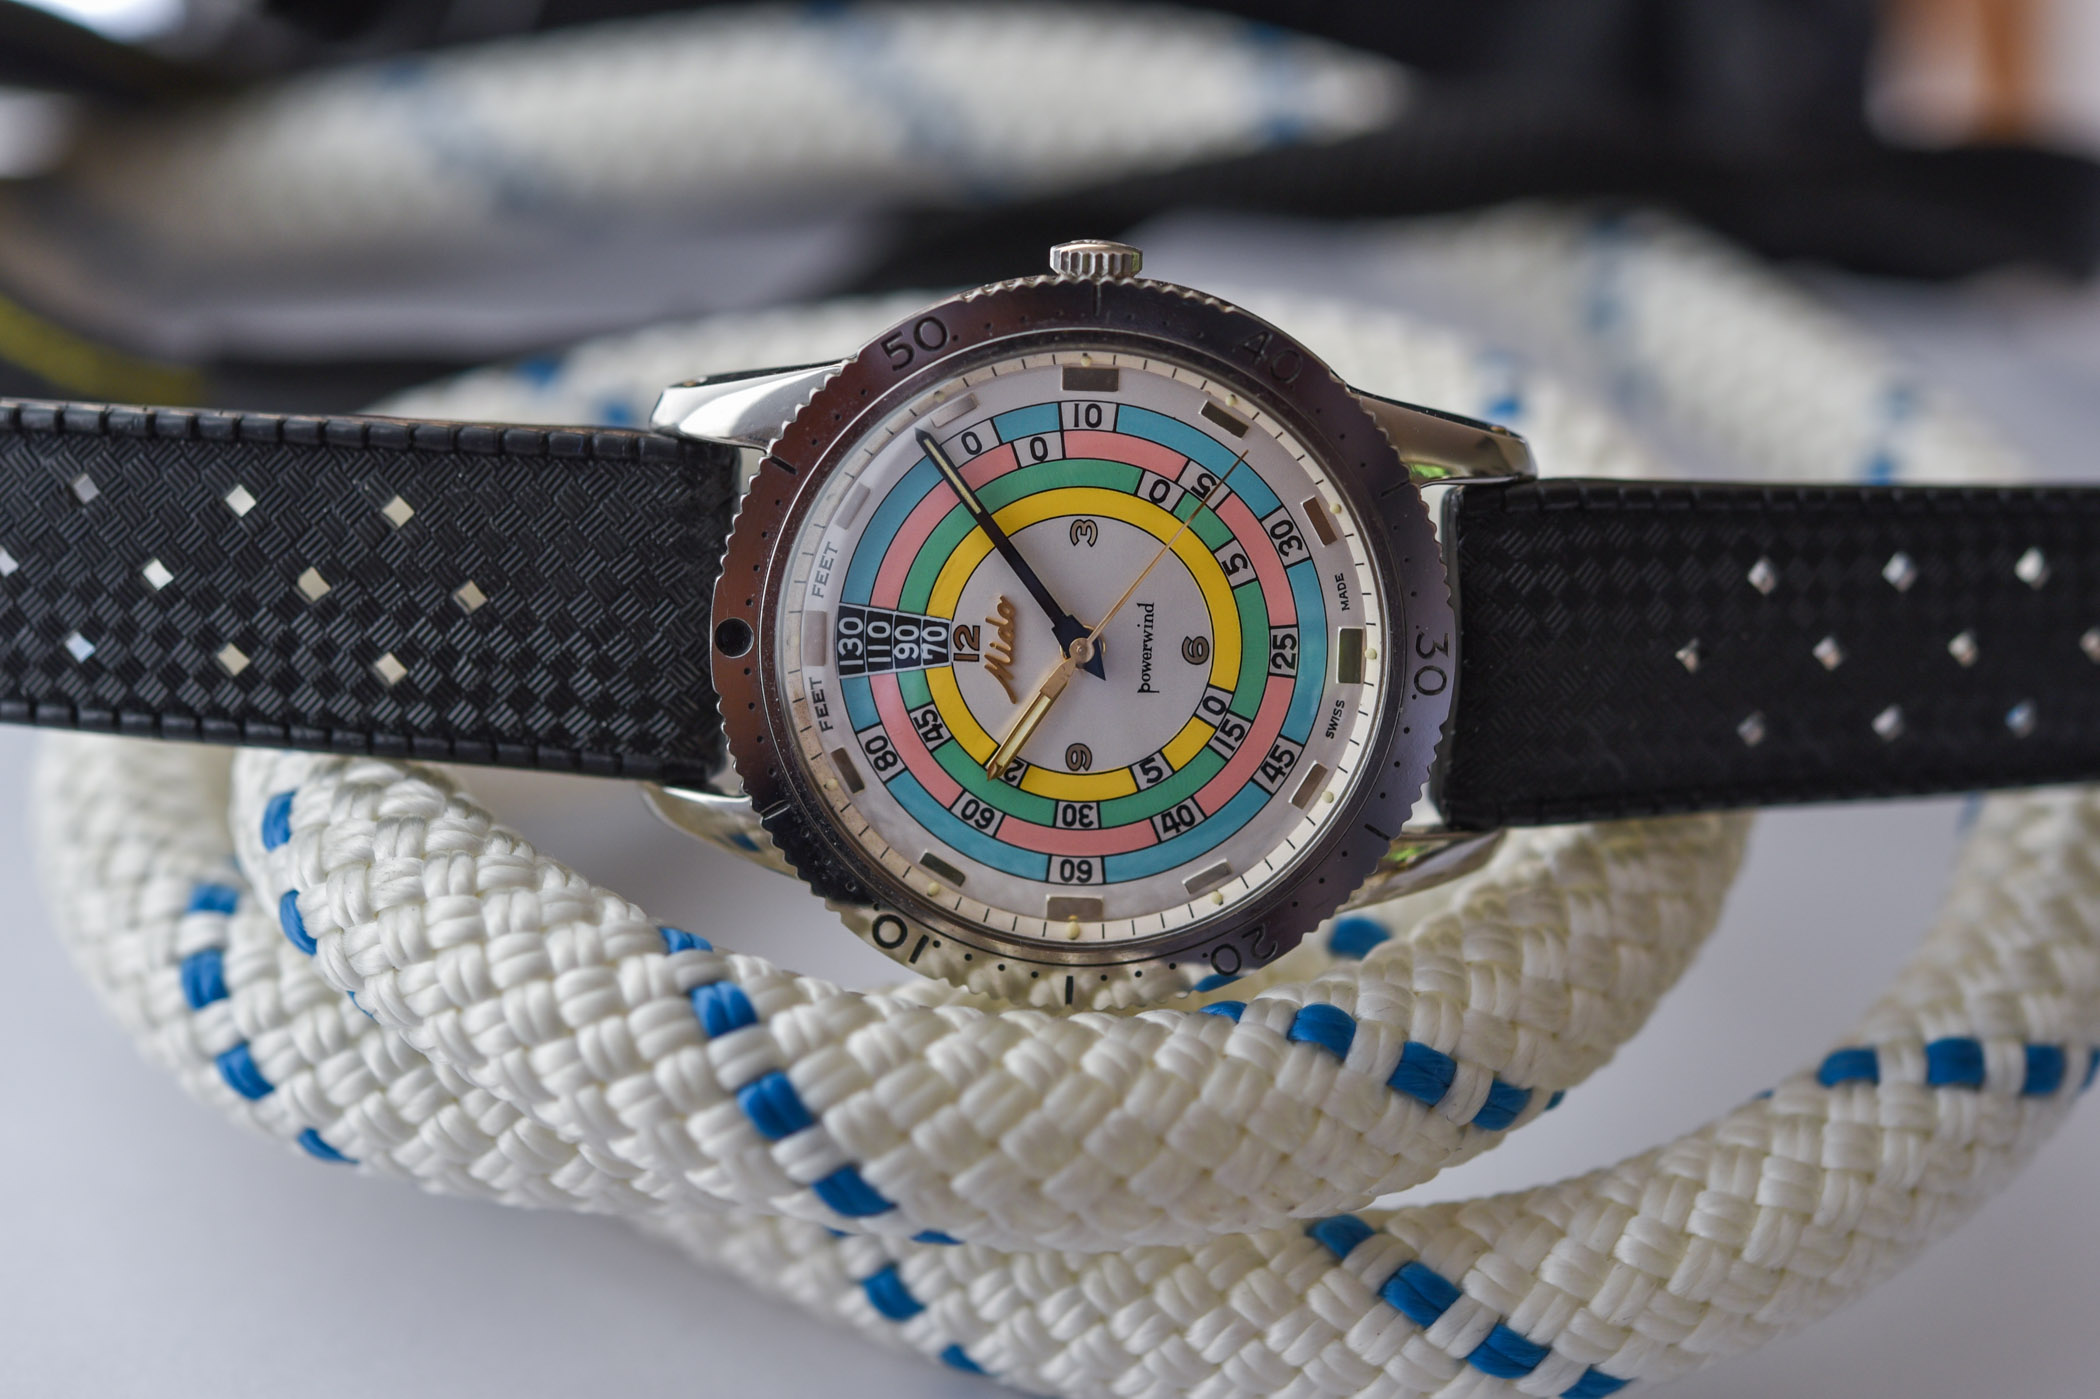 Mido Ocean Star Decompression Timer 1961 Limited Edition Rainbow Diver